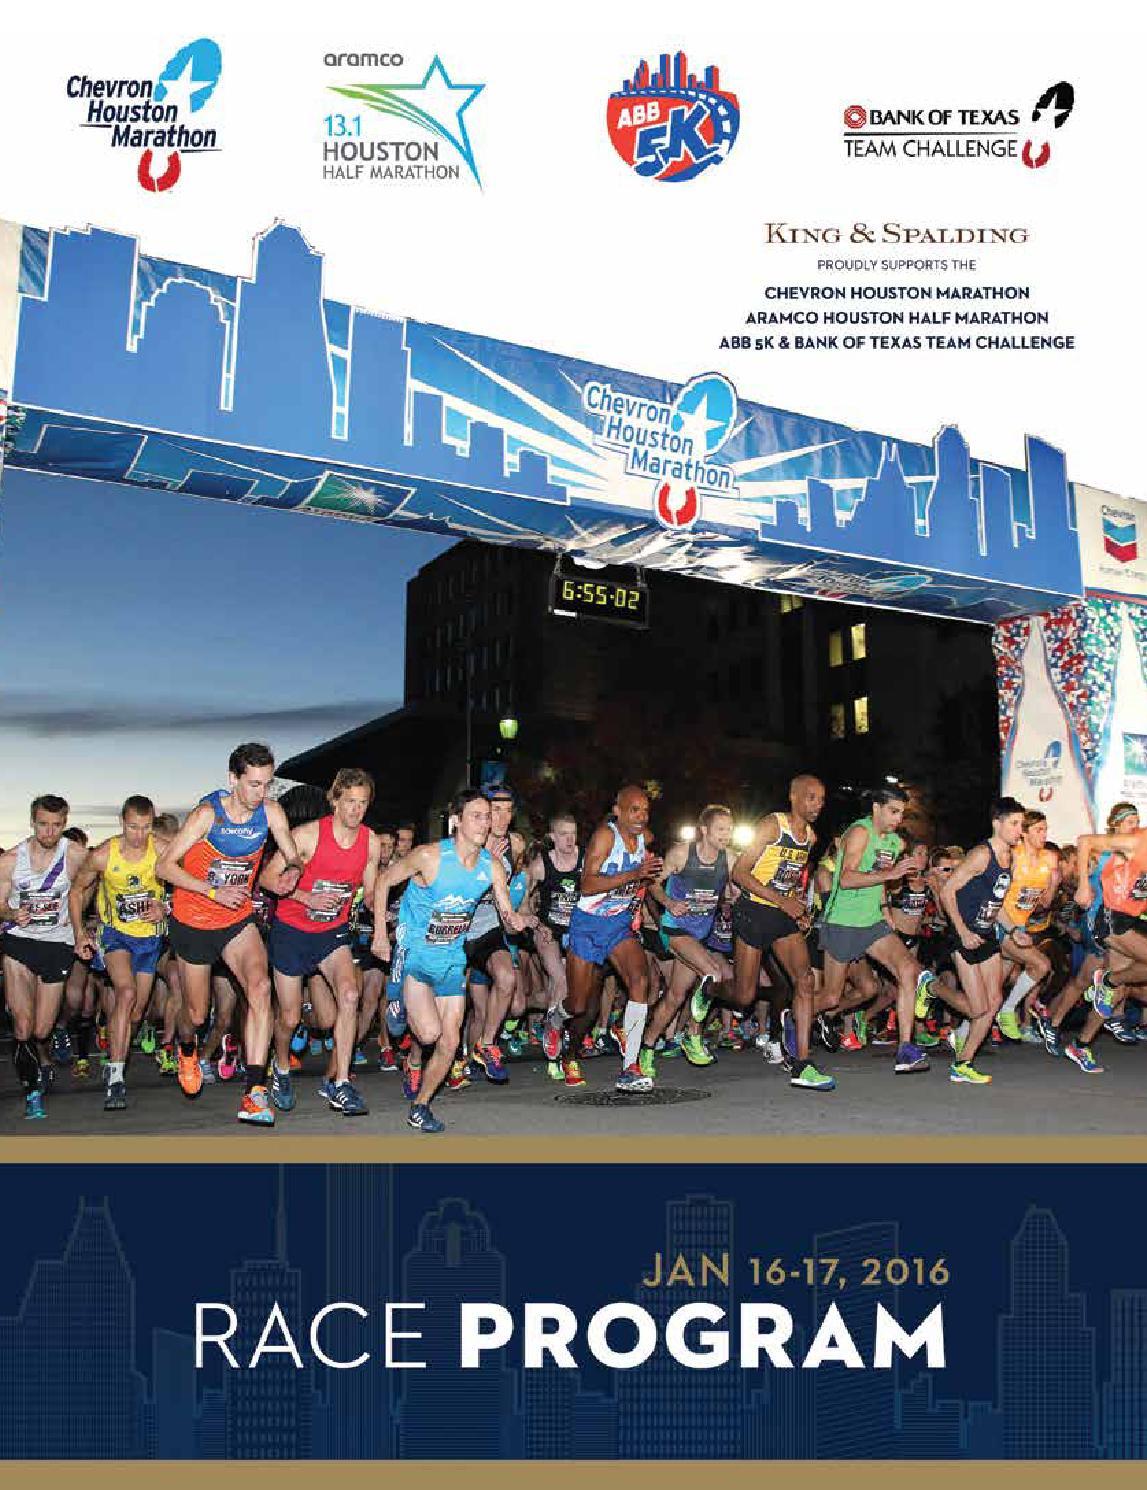 2016 Houston Marathon Program by Kelli L issuu